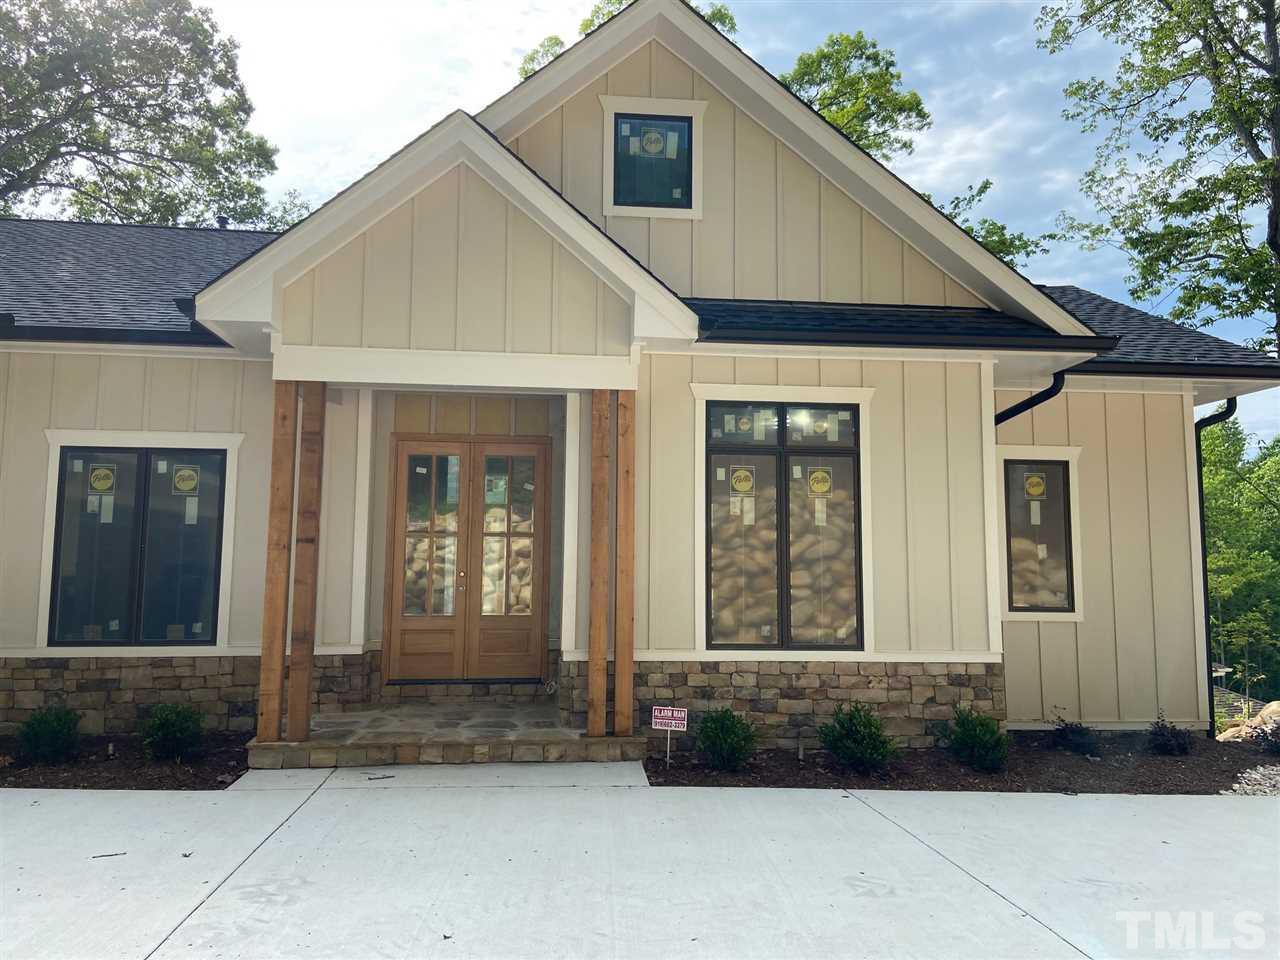 10371 Stephens, Chapel Hill, NC 27517